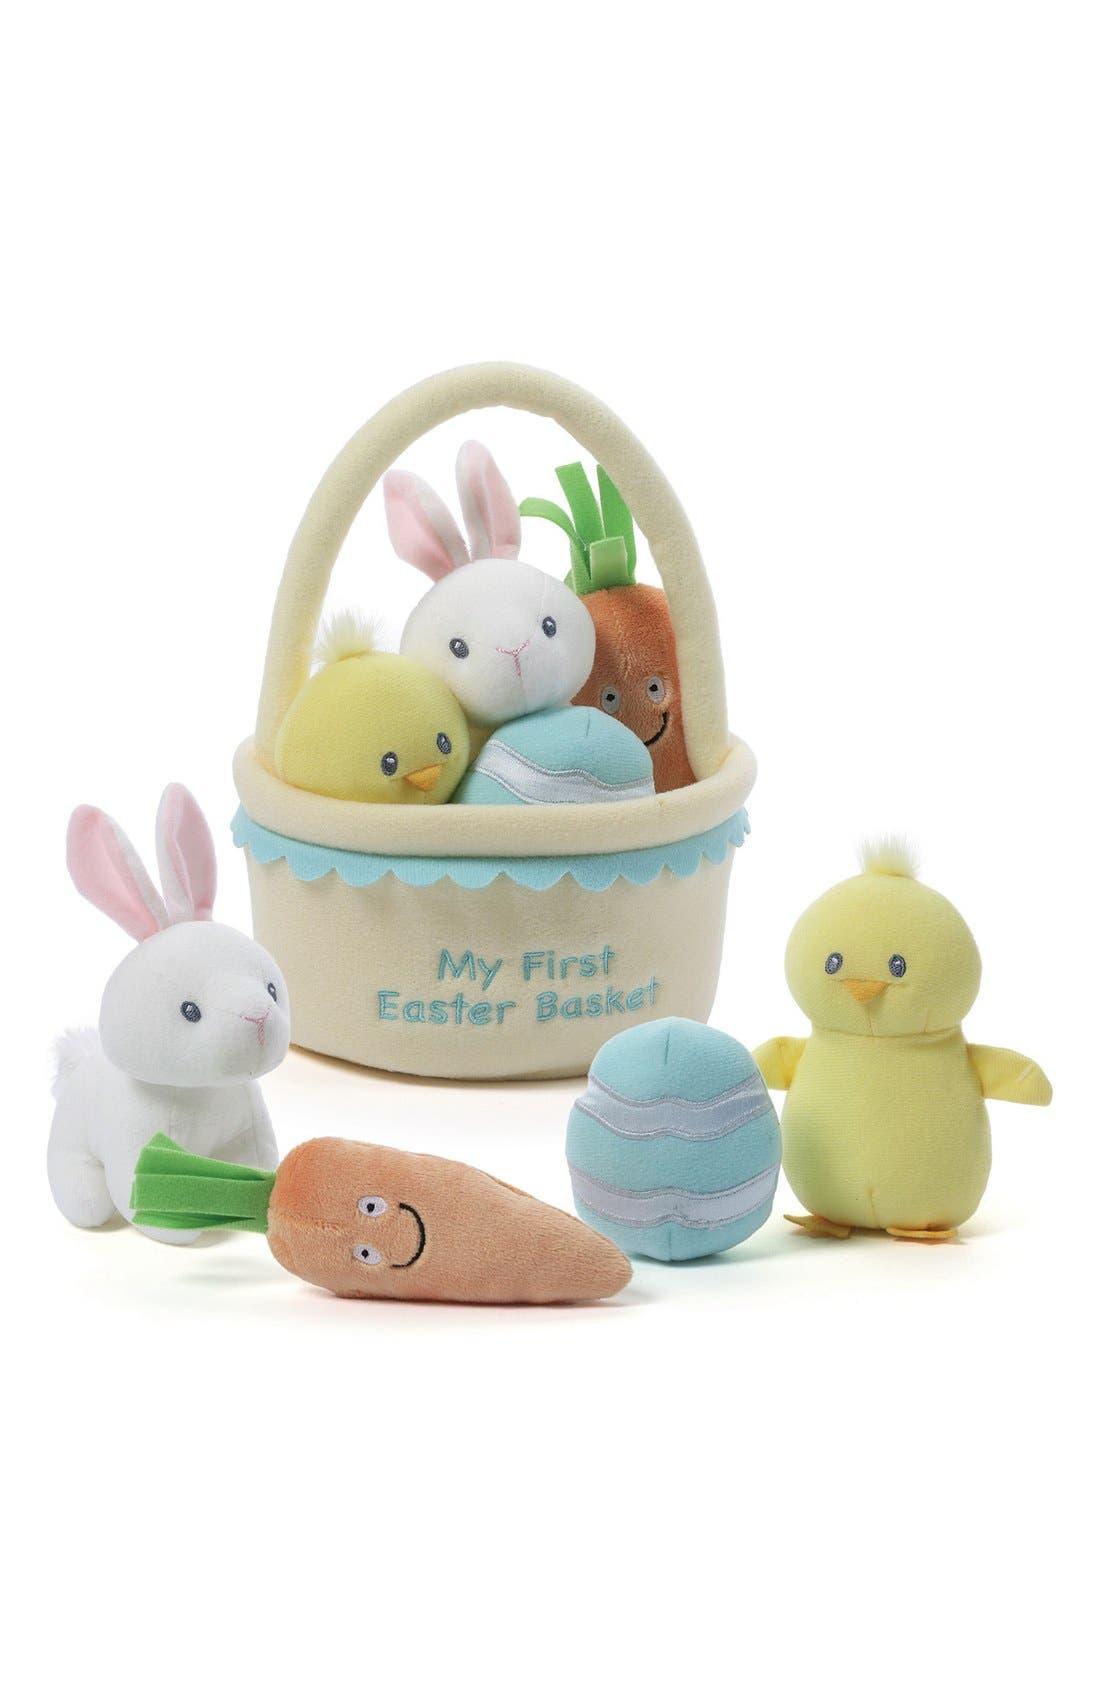 GUND Baby Gund 'My First Easter Basket' Plush Play Set, Main, color, YELLOW